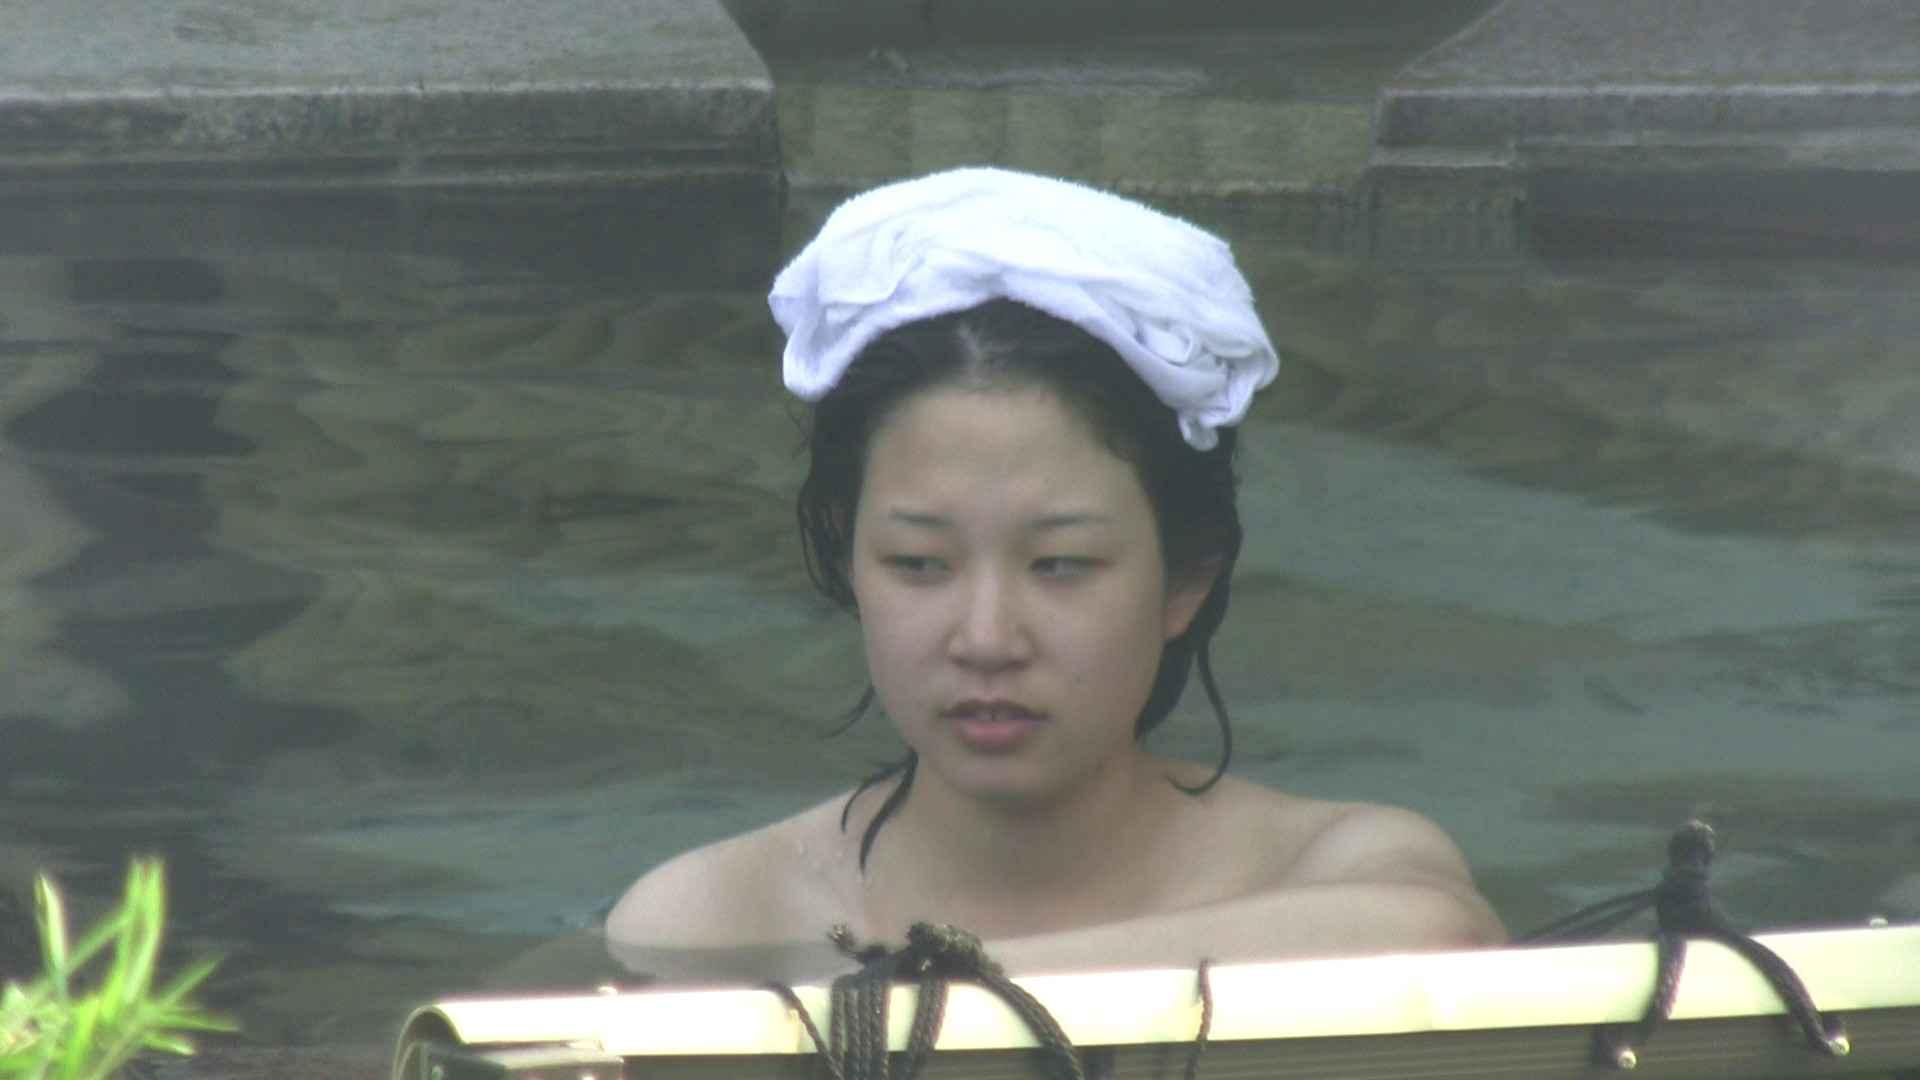 Aquaな露天風呂Vol.172 盗撮映像  113Pix 31